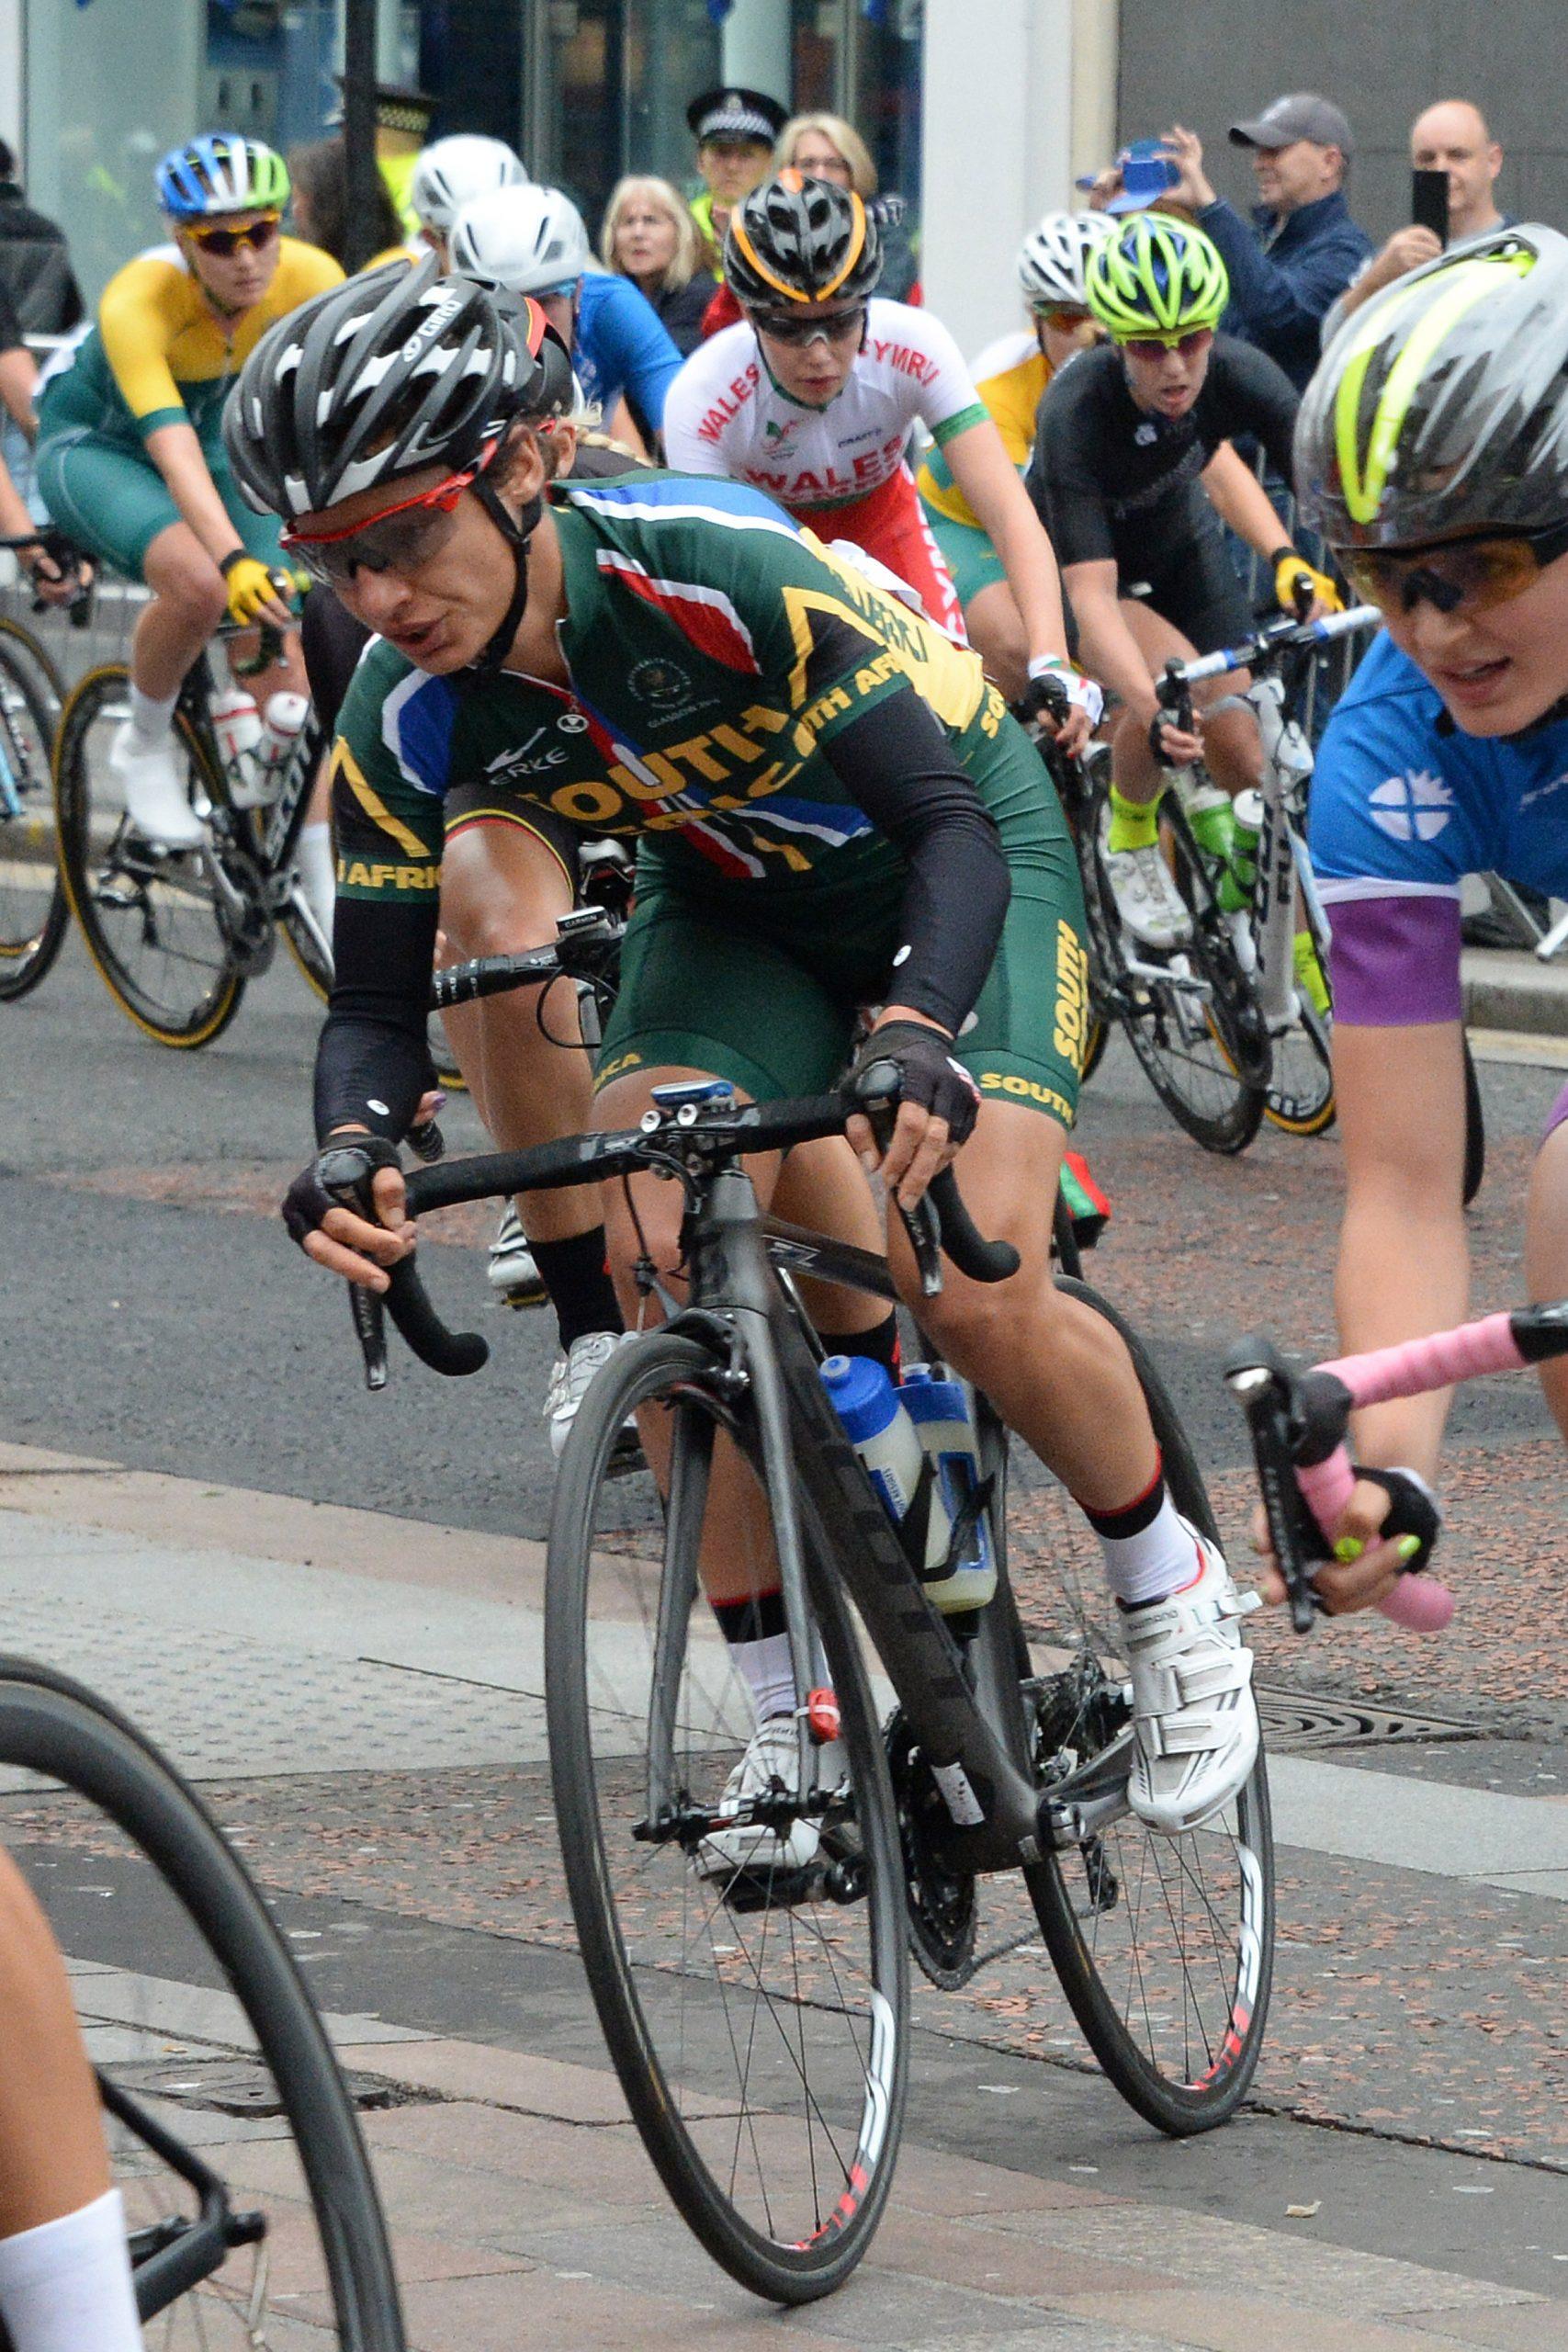 'I threw my bike at the line' says Moolman of bronze